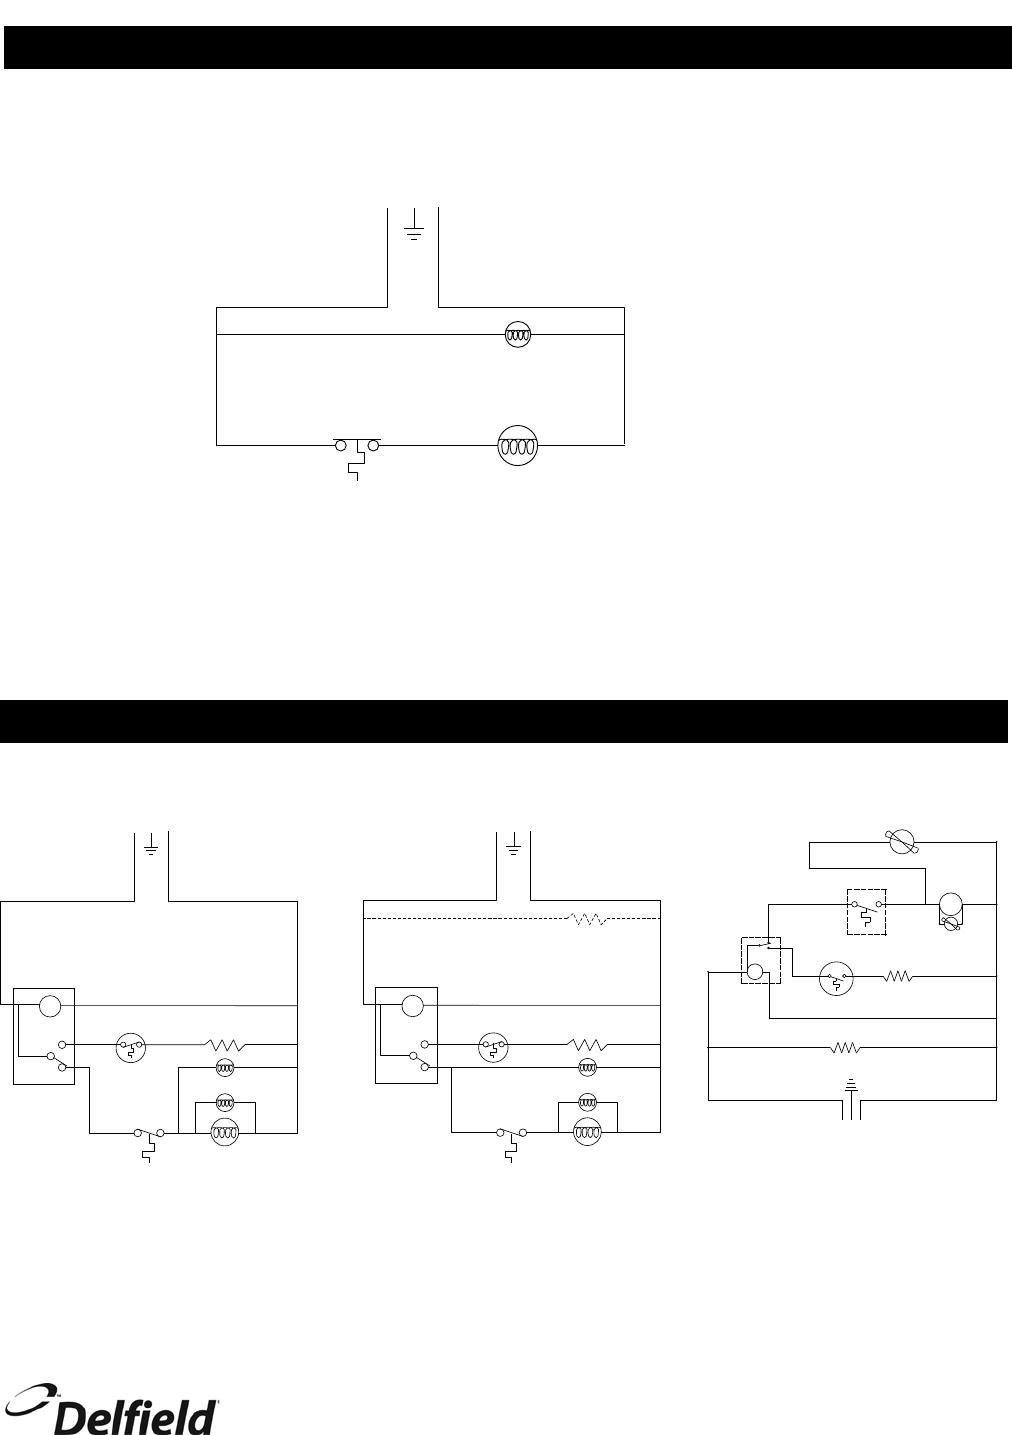 [TBQL_4184]  Delfield Enodis 400 Series Users Manual   Delfield Freezer Wiring Diagram Mini      UserManual.wiki